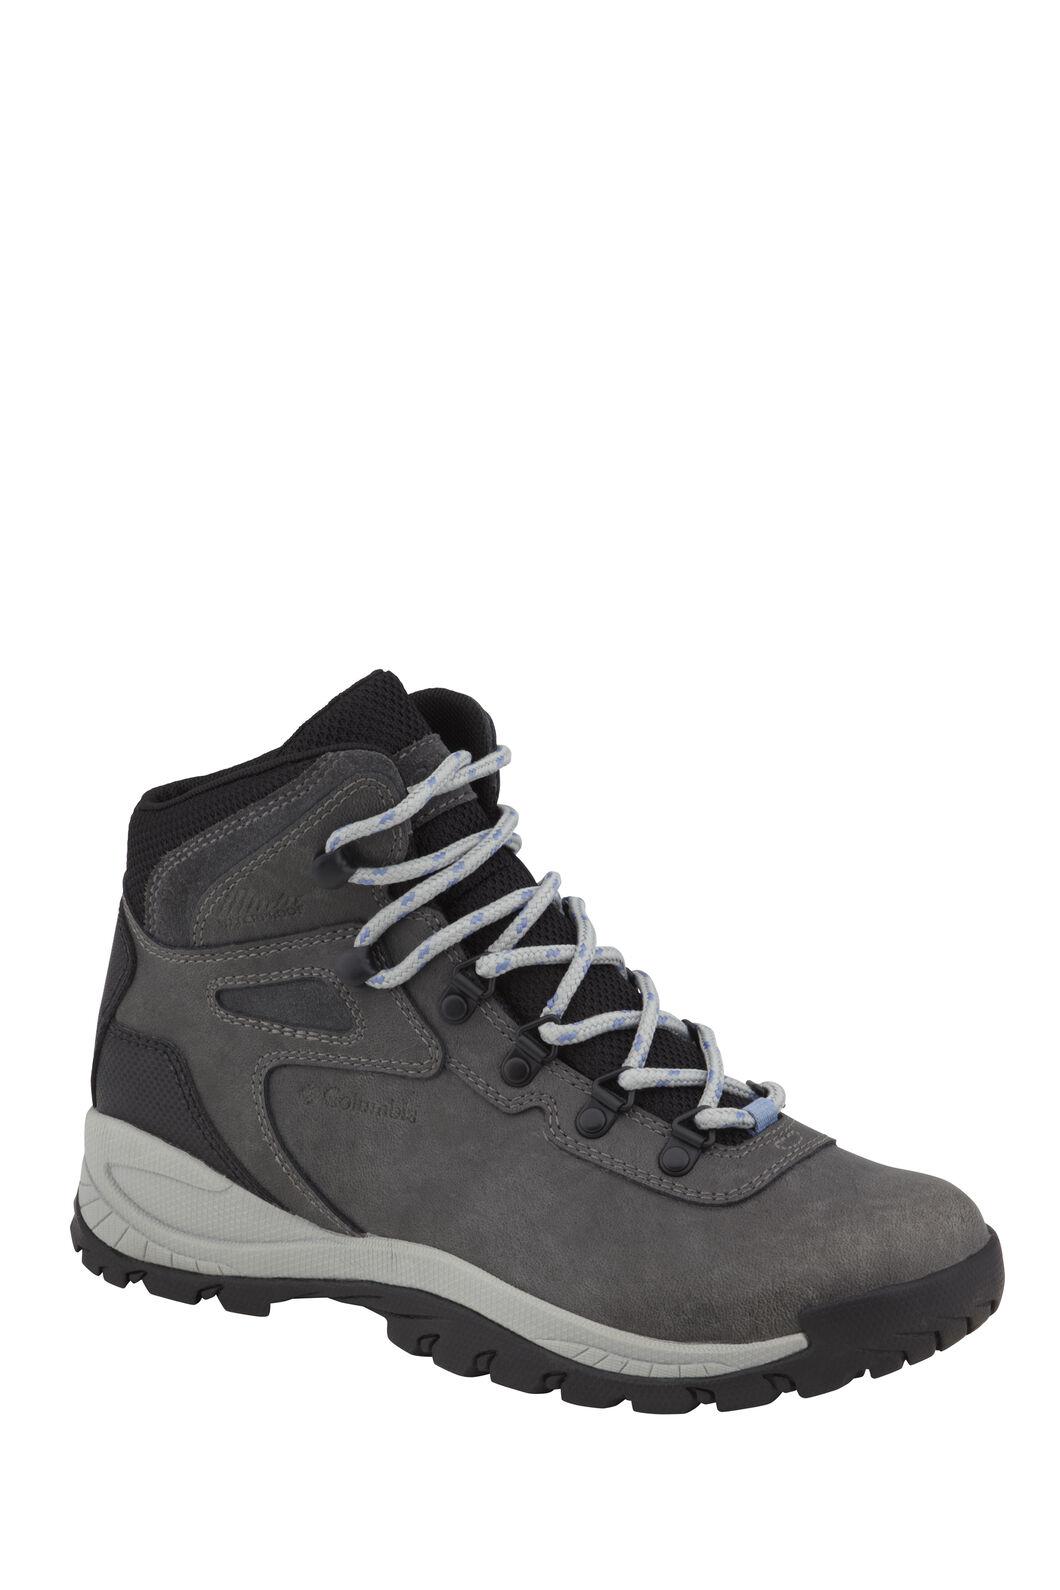 Columbia Women's Newton Ridge Plus Hiking Boots QuarryCool Wave, QUARRY/COOL WAVE, hi-res